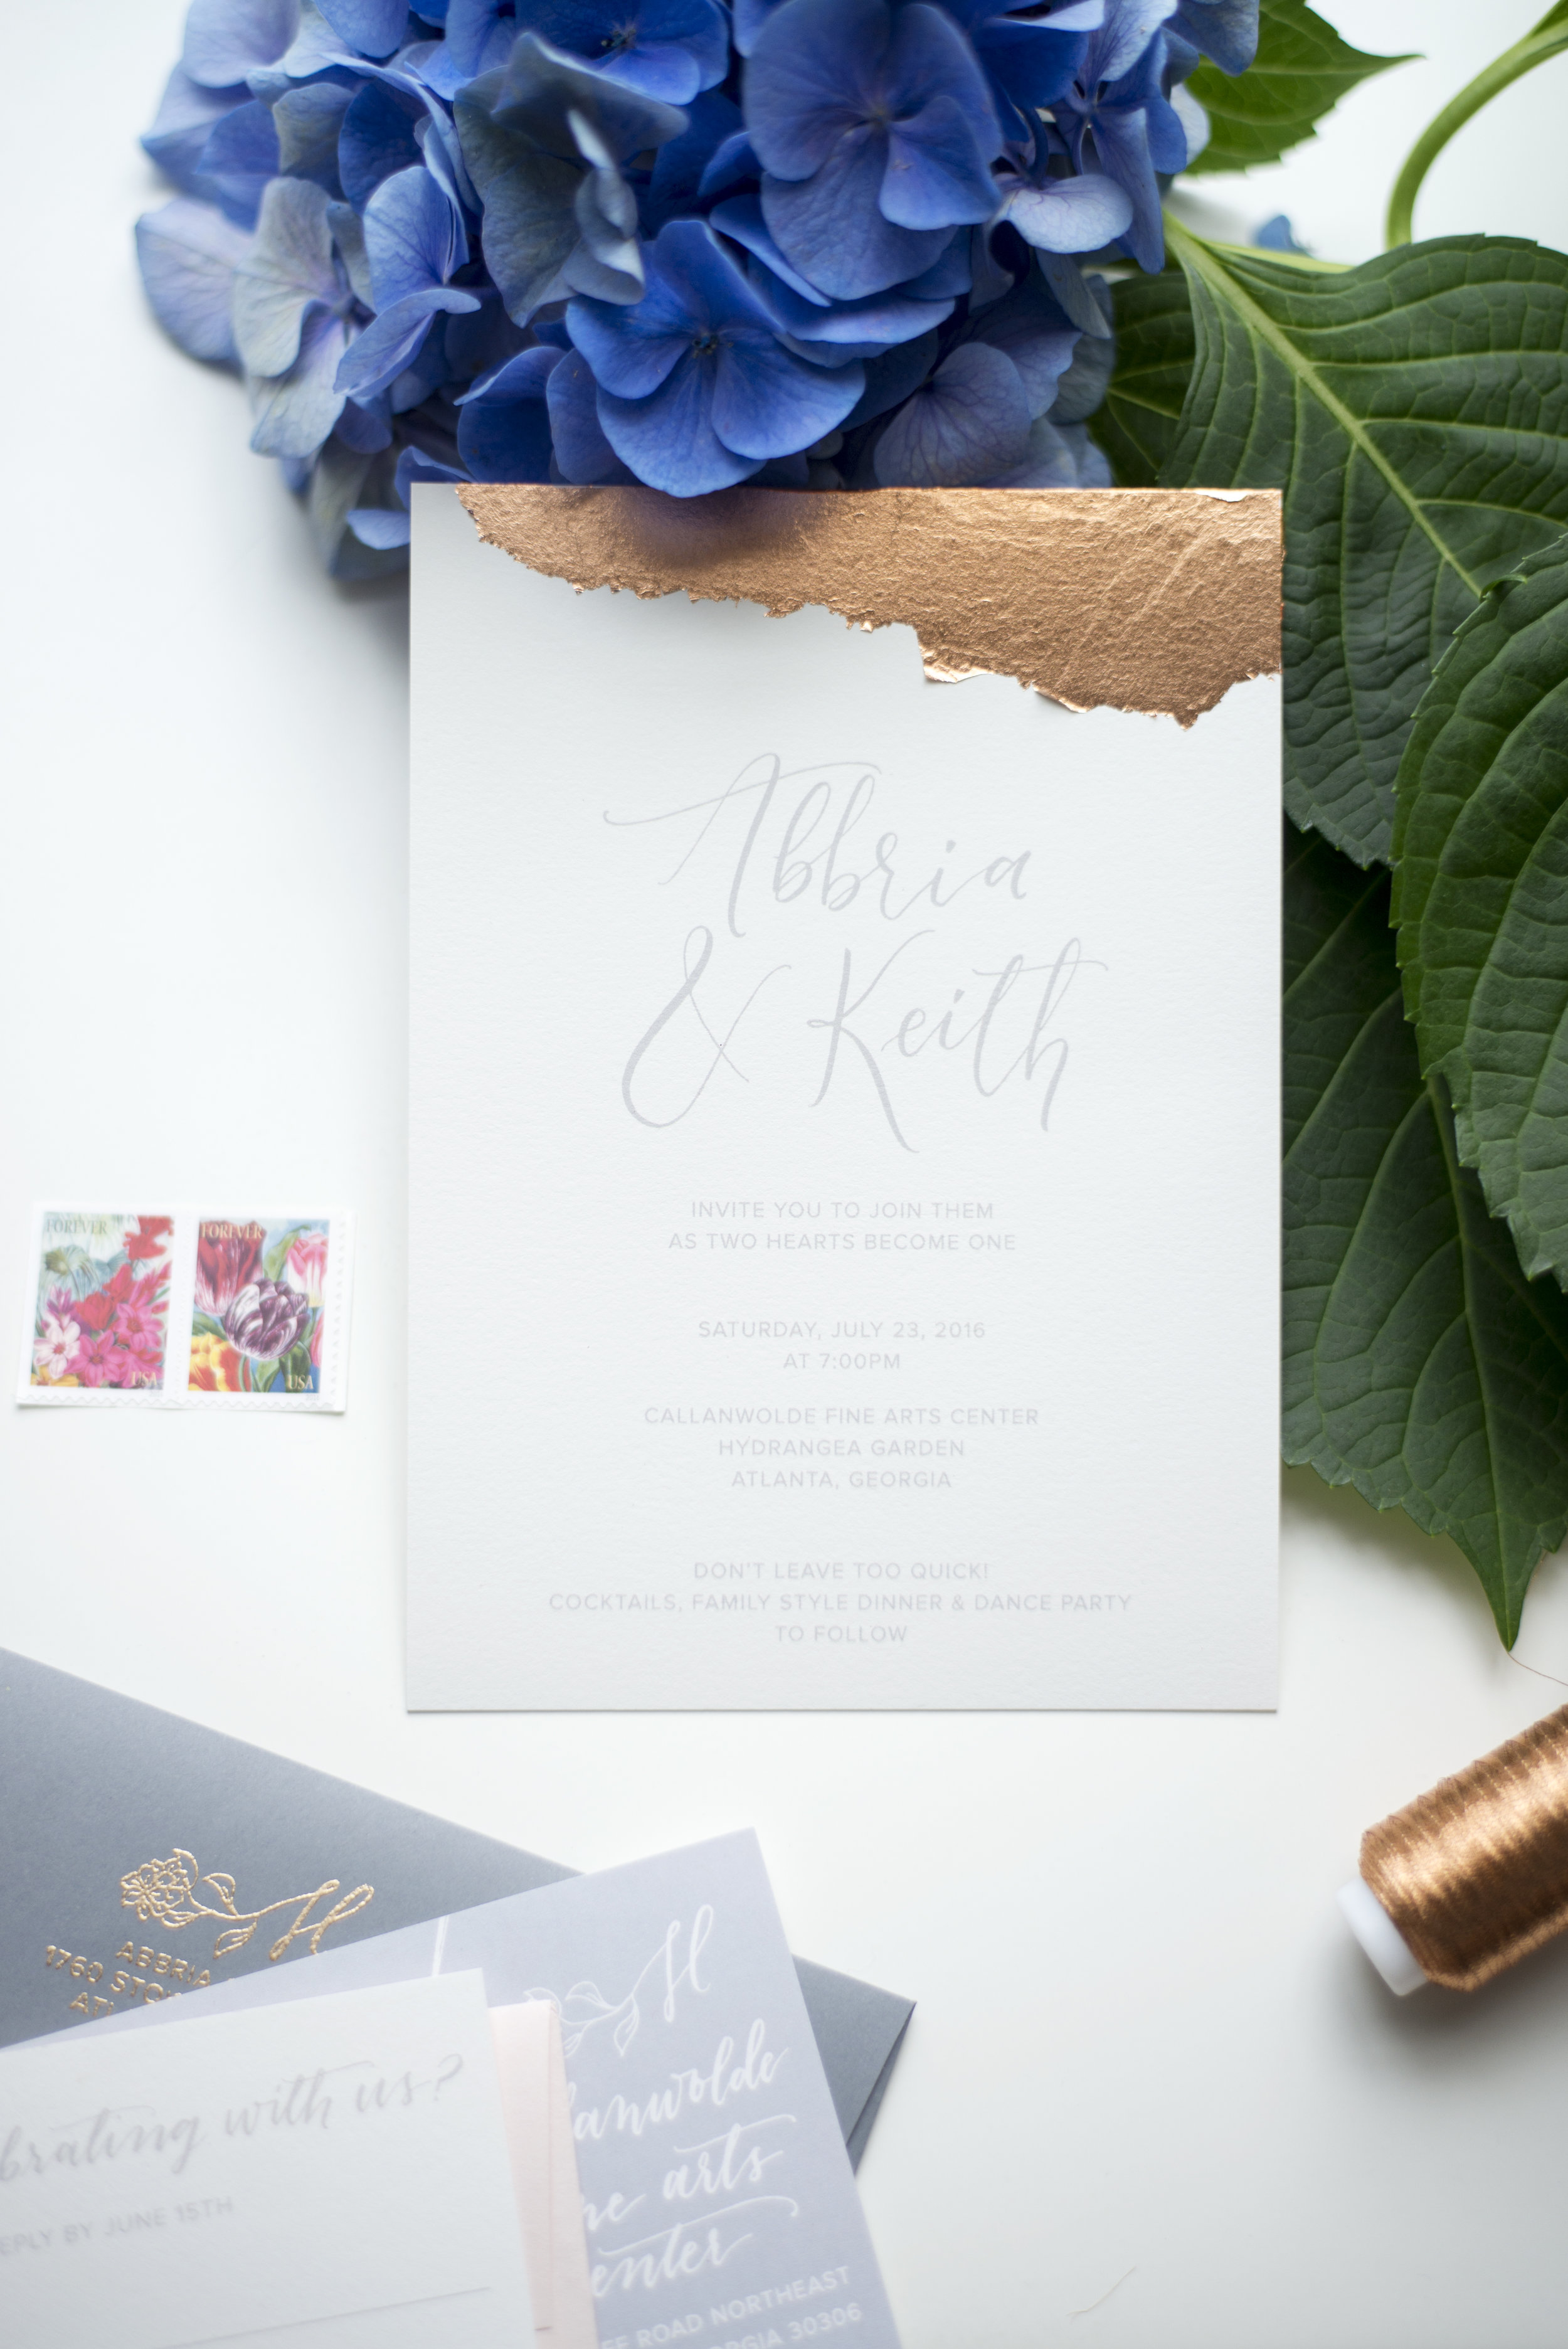 heylux_abbriakeith_wedding_2.jpg